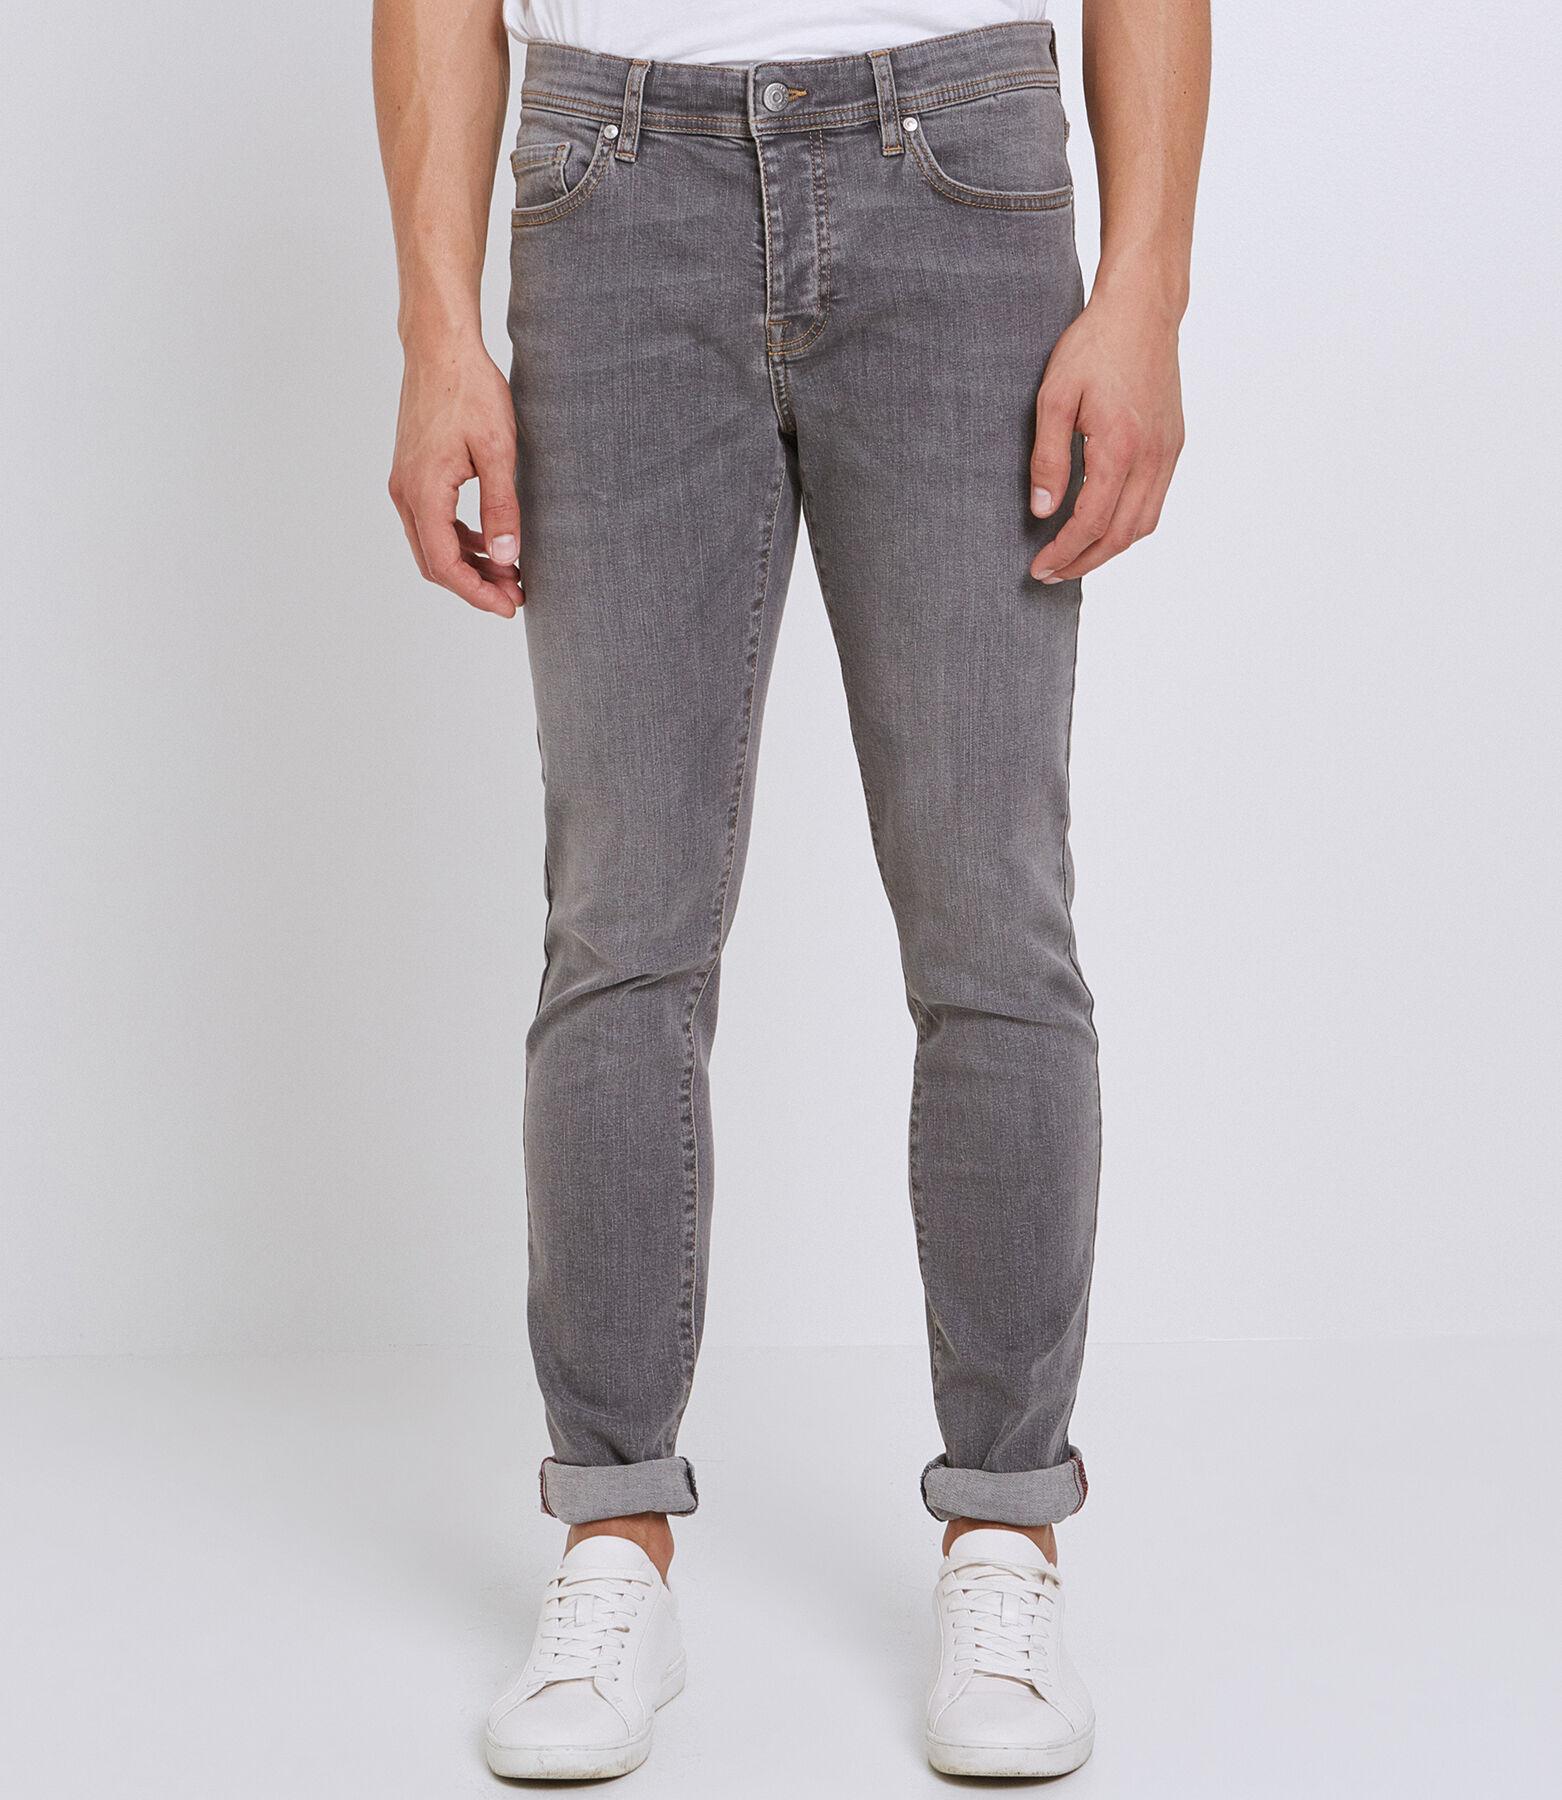 Slim jeans, grijs, instapprijs